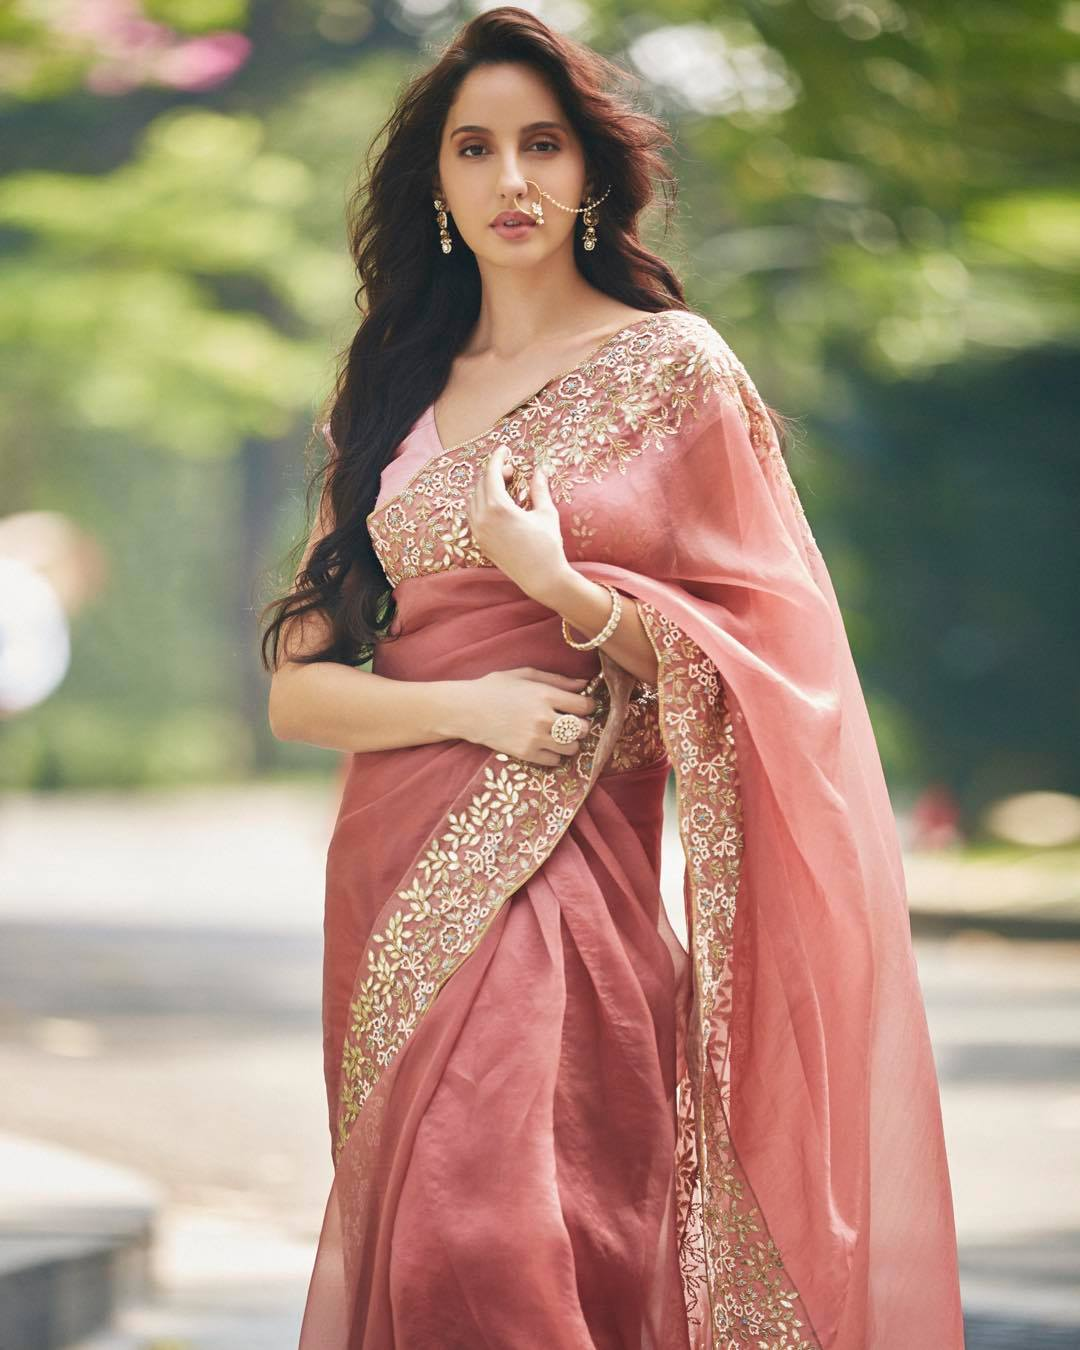 Nora Fatehi in Indian Saree